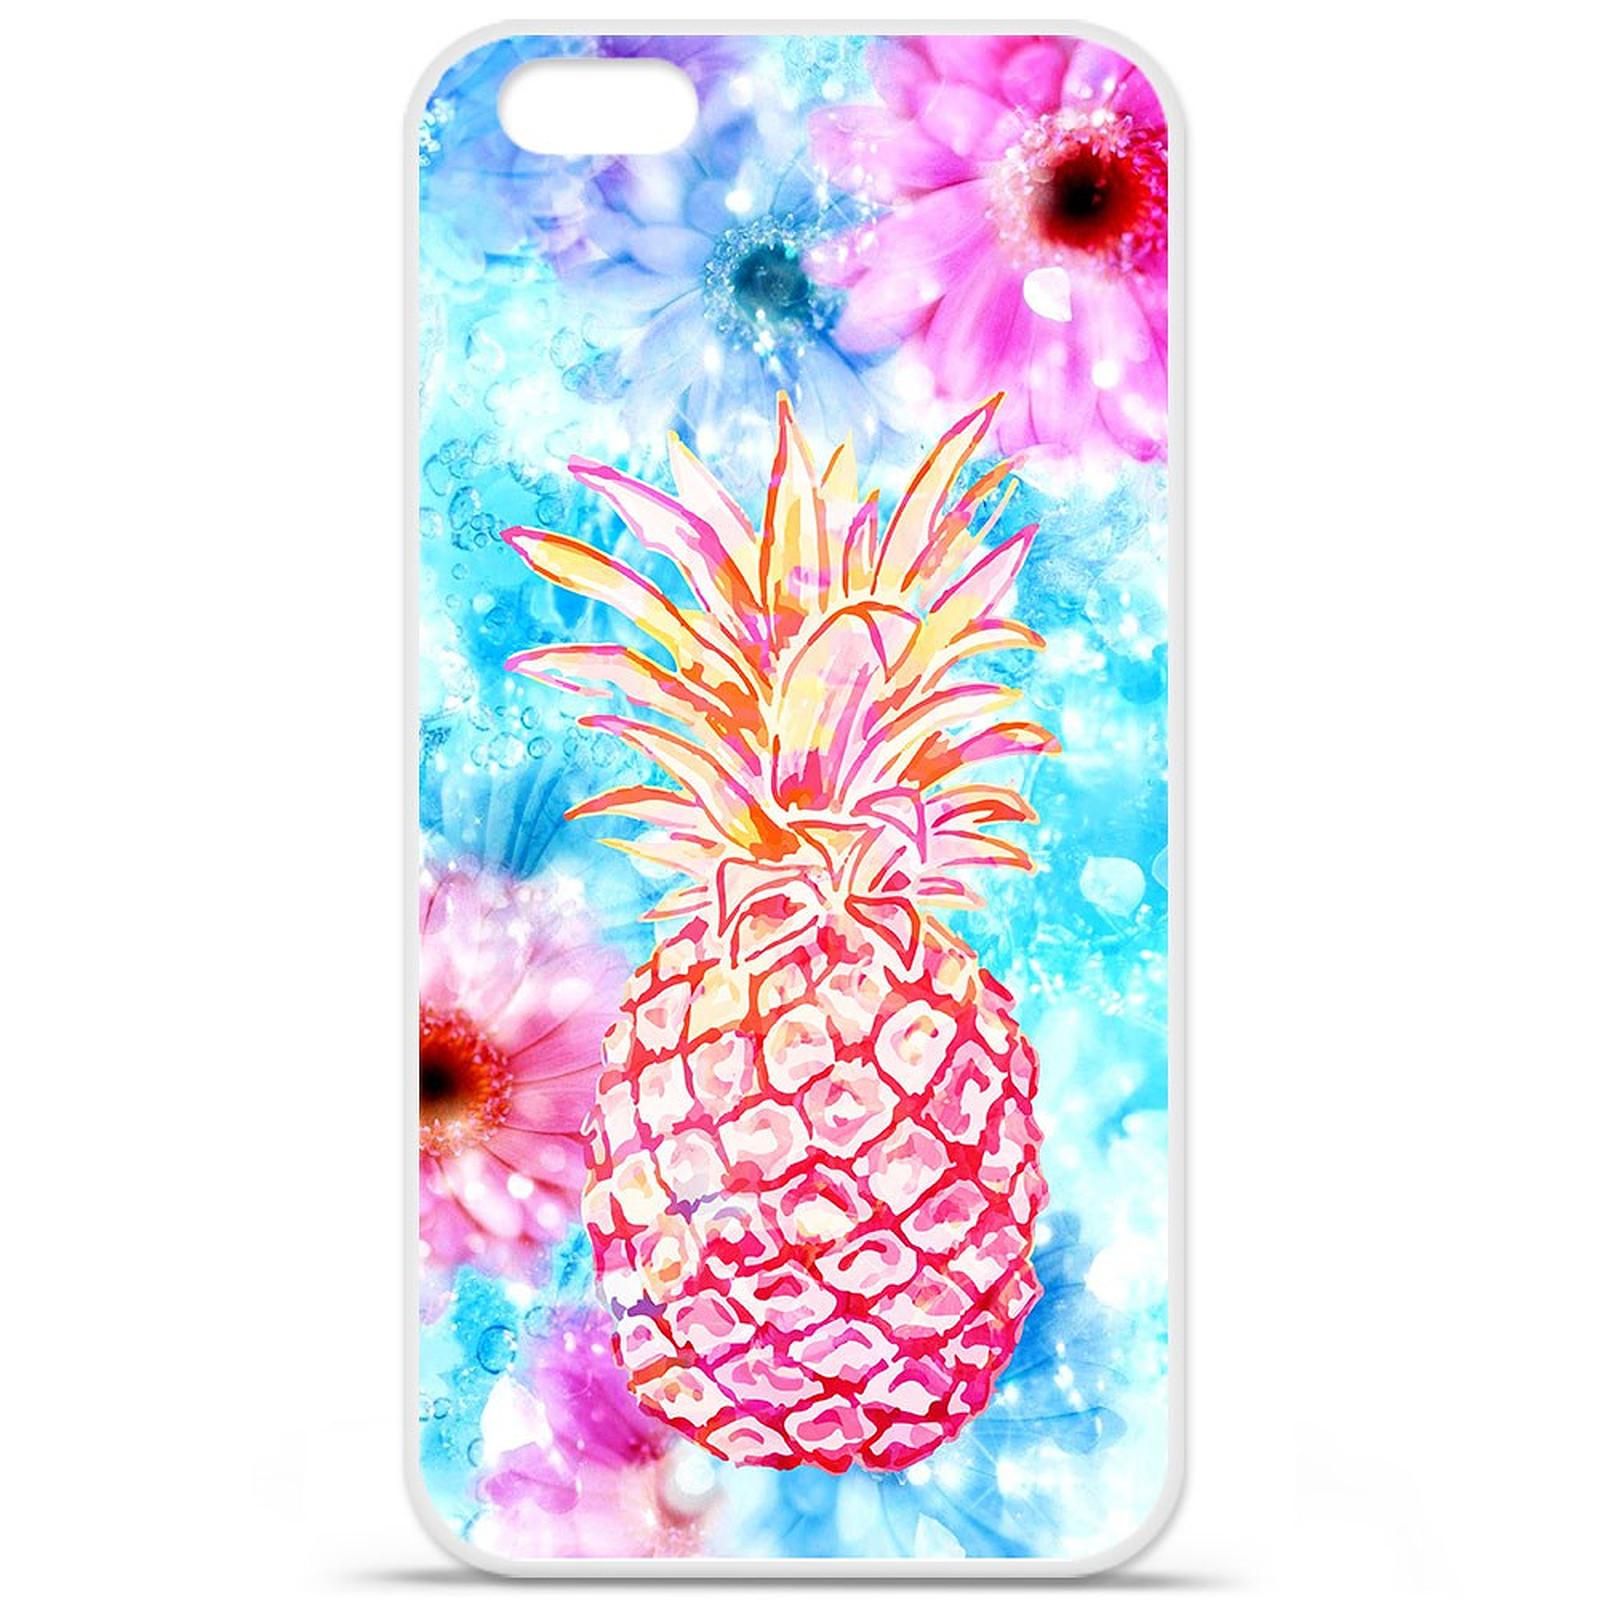 1001 Coques Coque silicone gel Apple IPhone 7 Plus motif Ananas